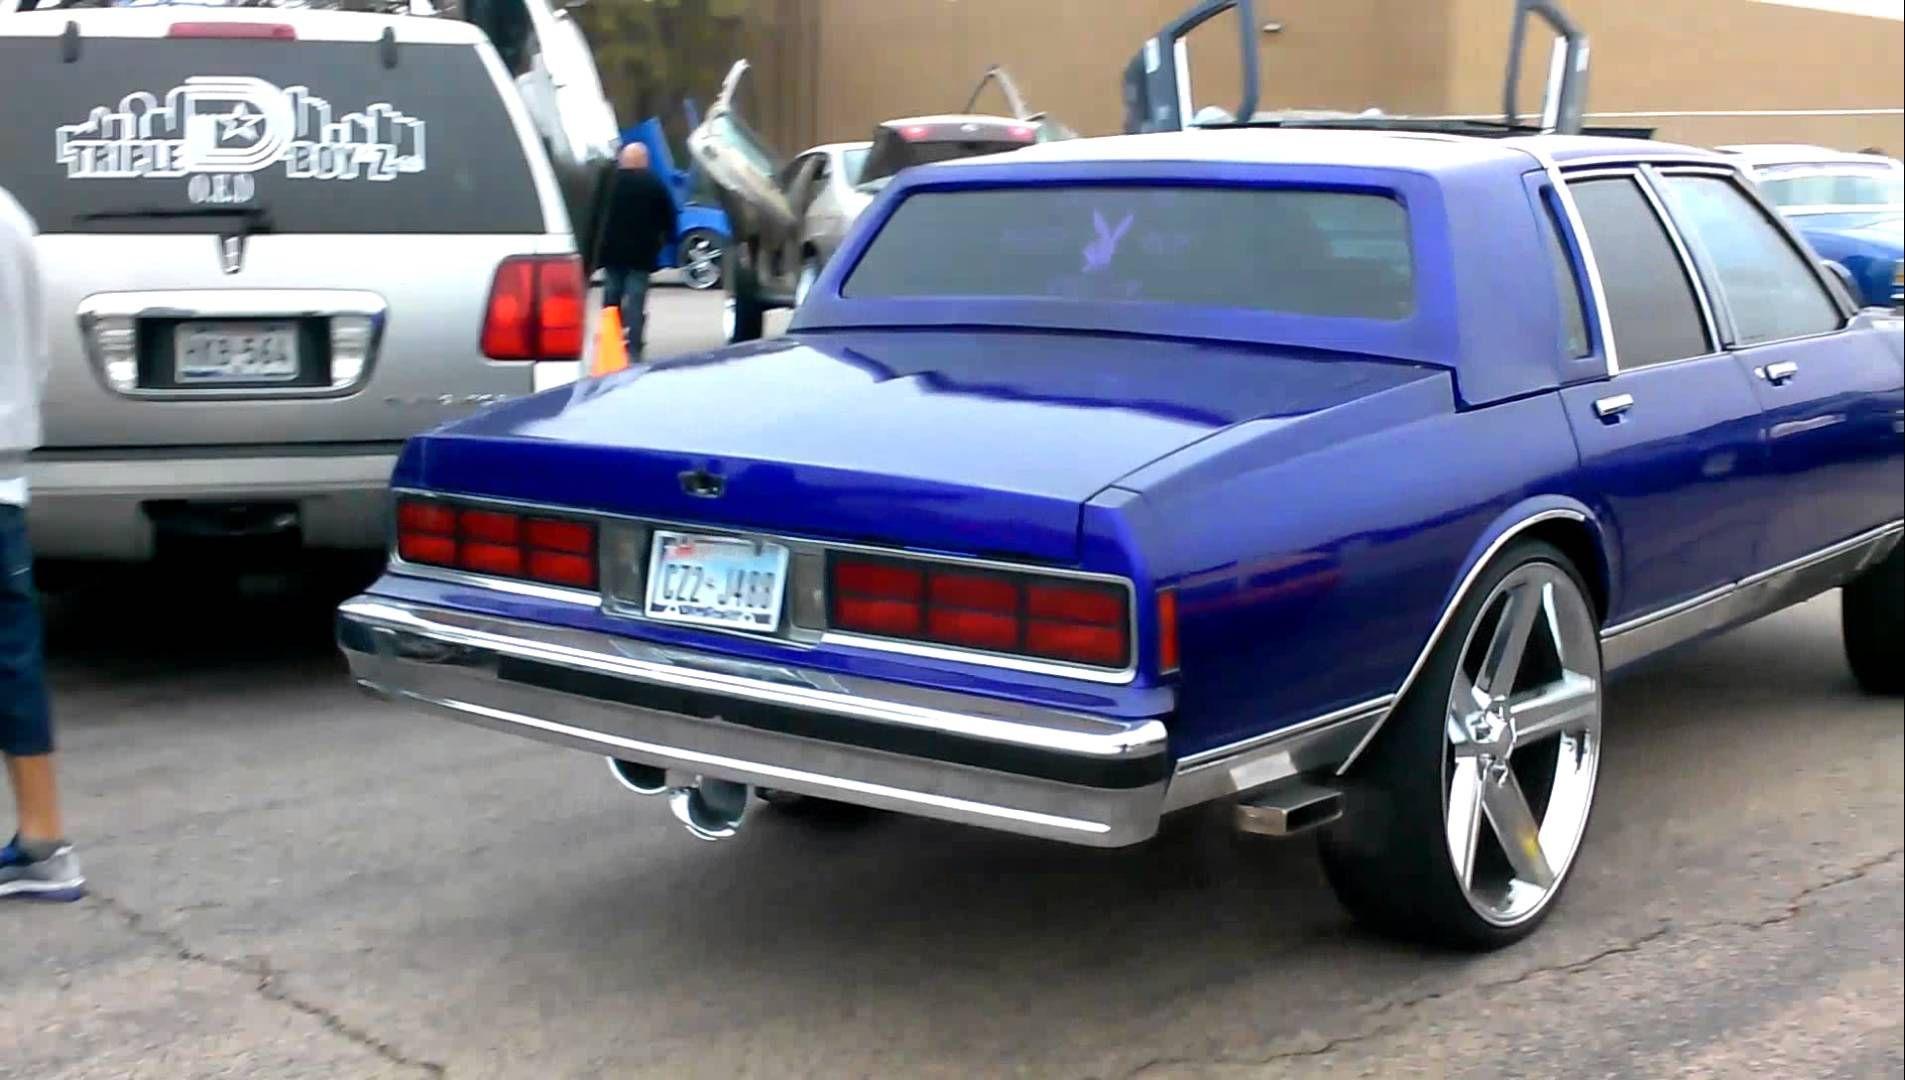 Papa Smurf Rims For Sale Chevy Impala Chevy